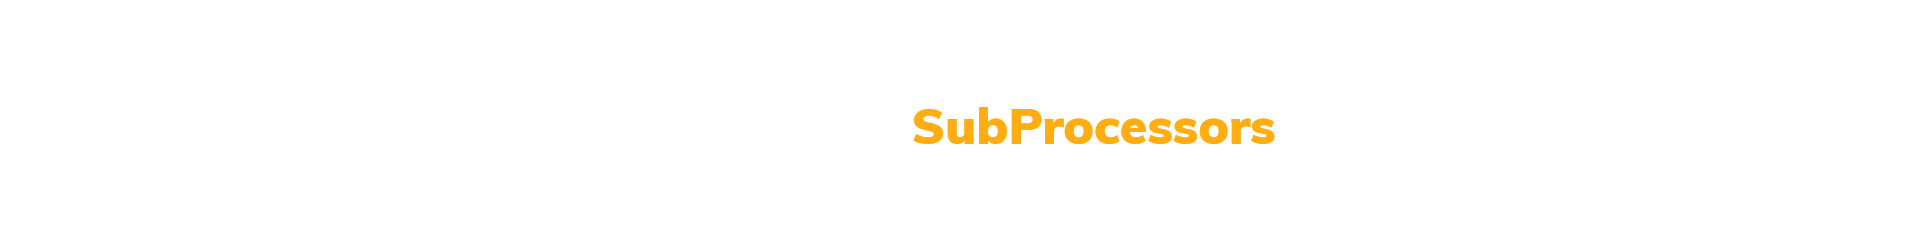 My-Digital-SubProcessors